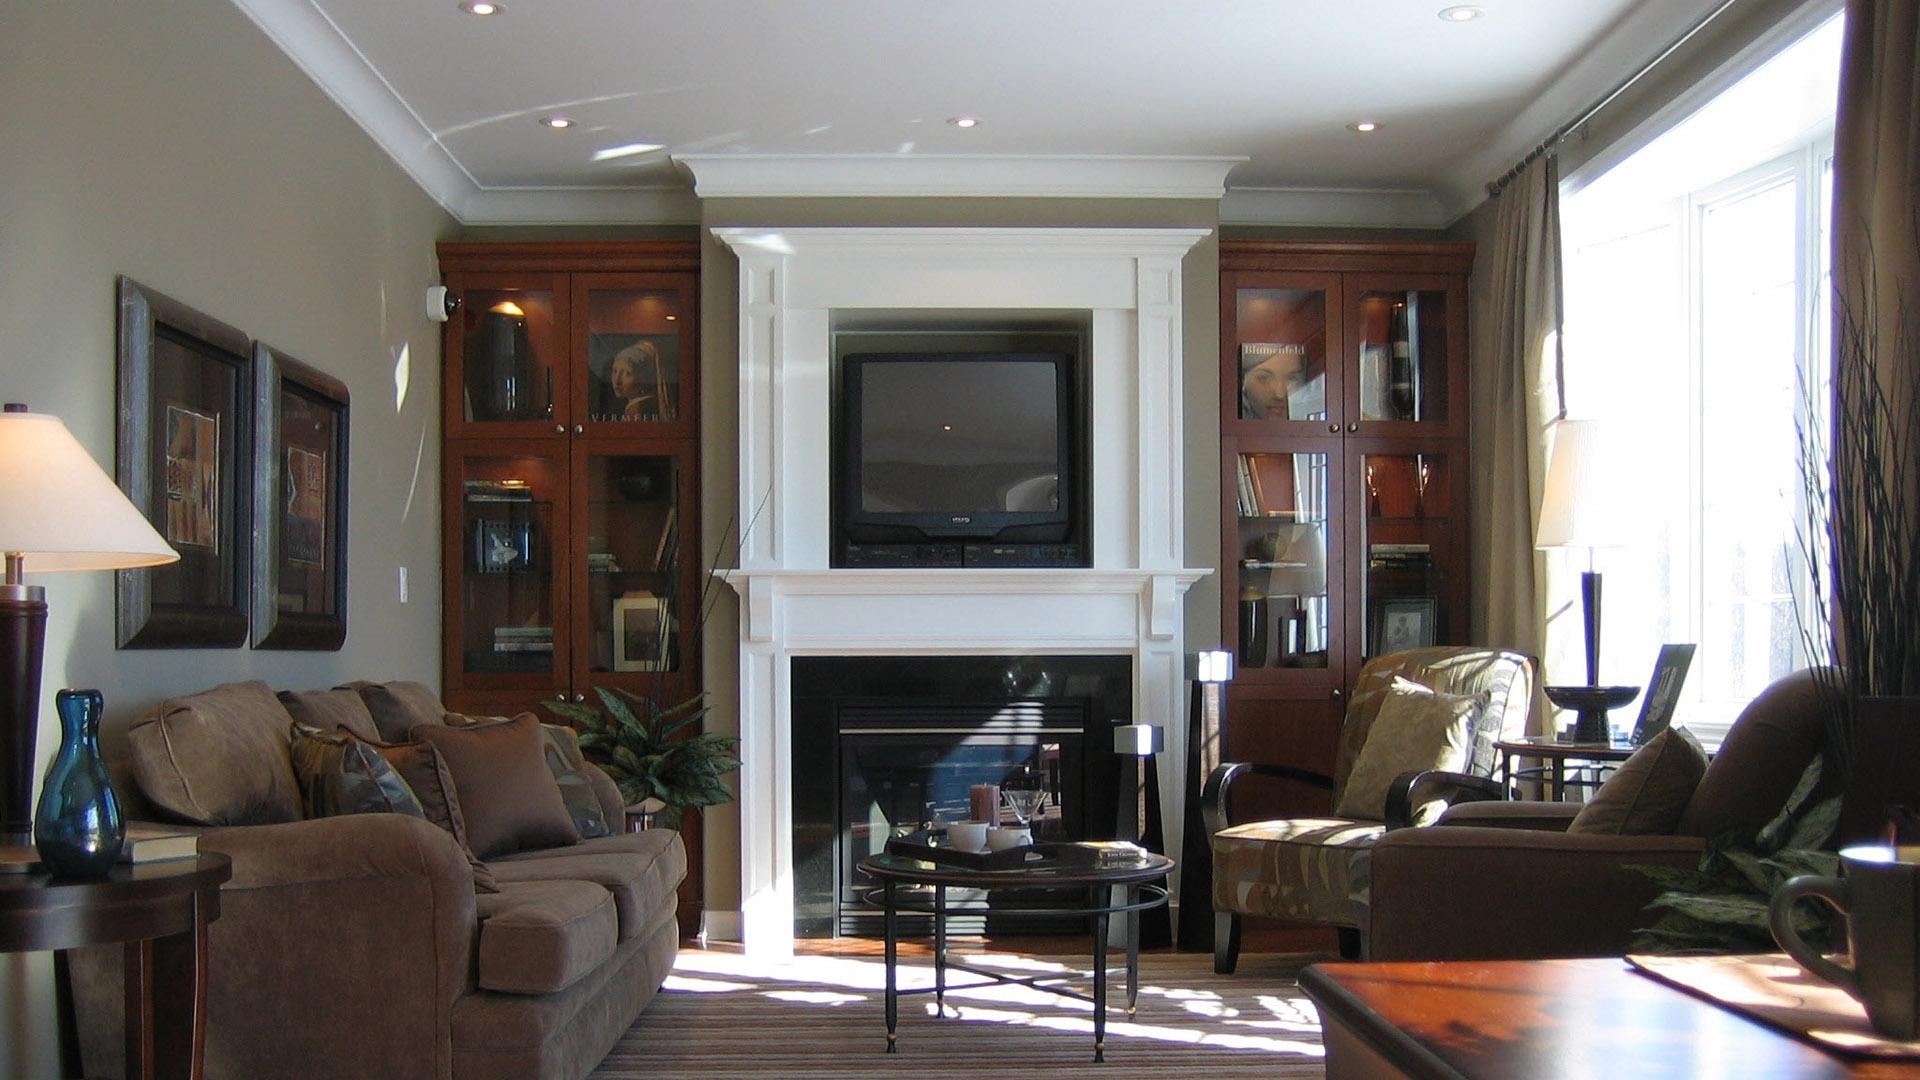 Download Wallpaper 1920x1080 Living Room Bathroom Tv Furniture